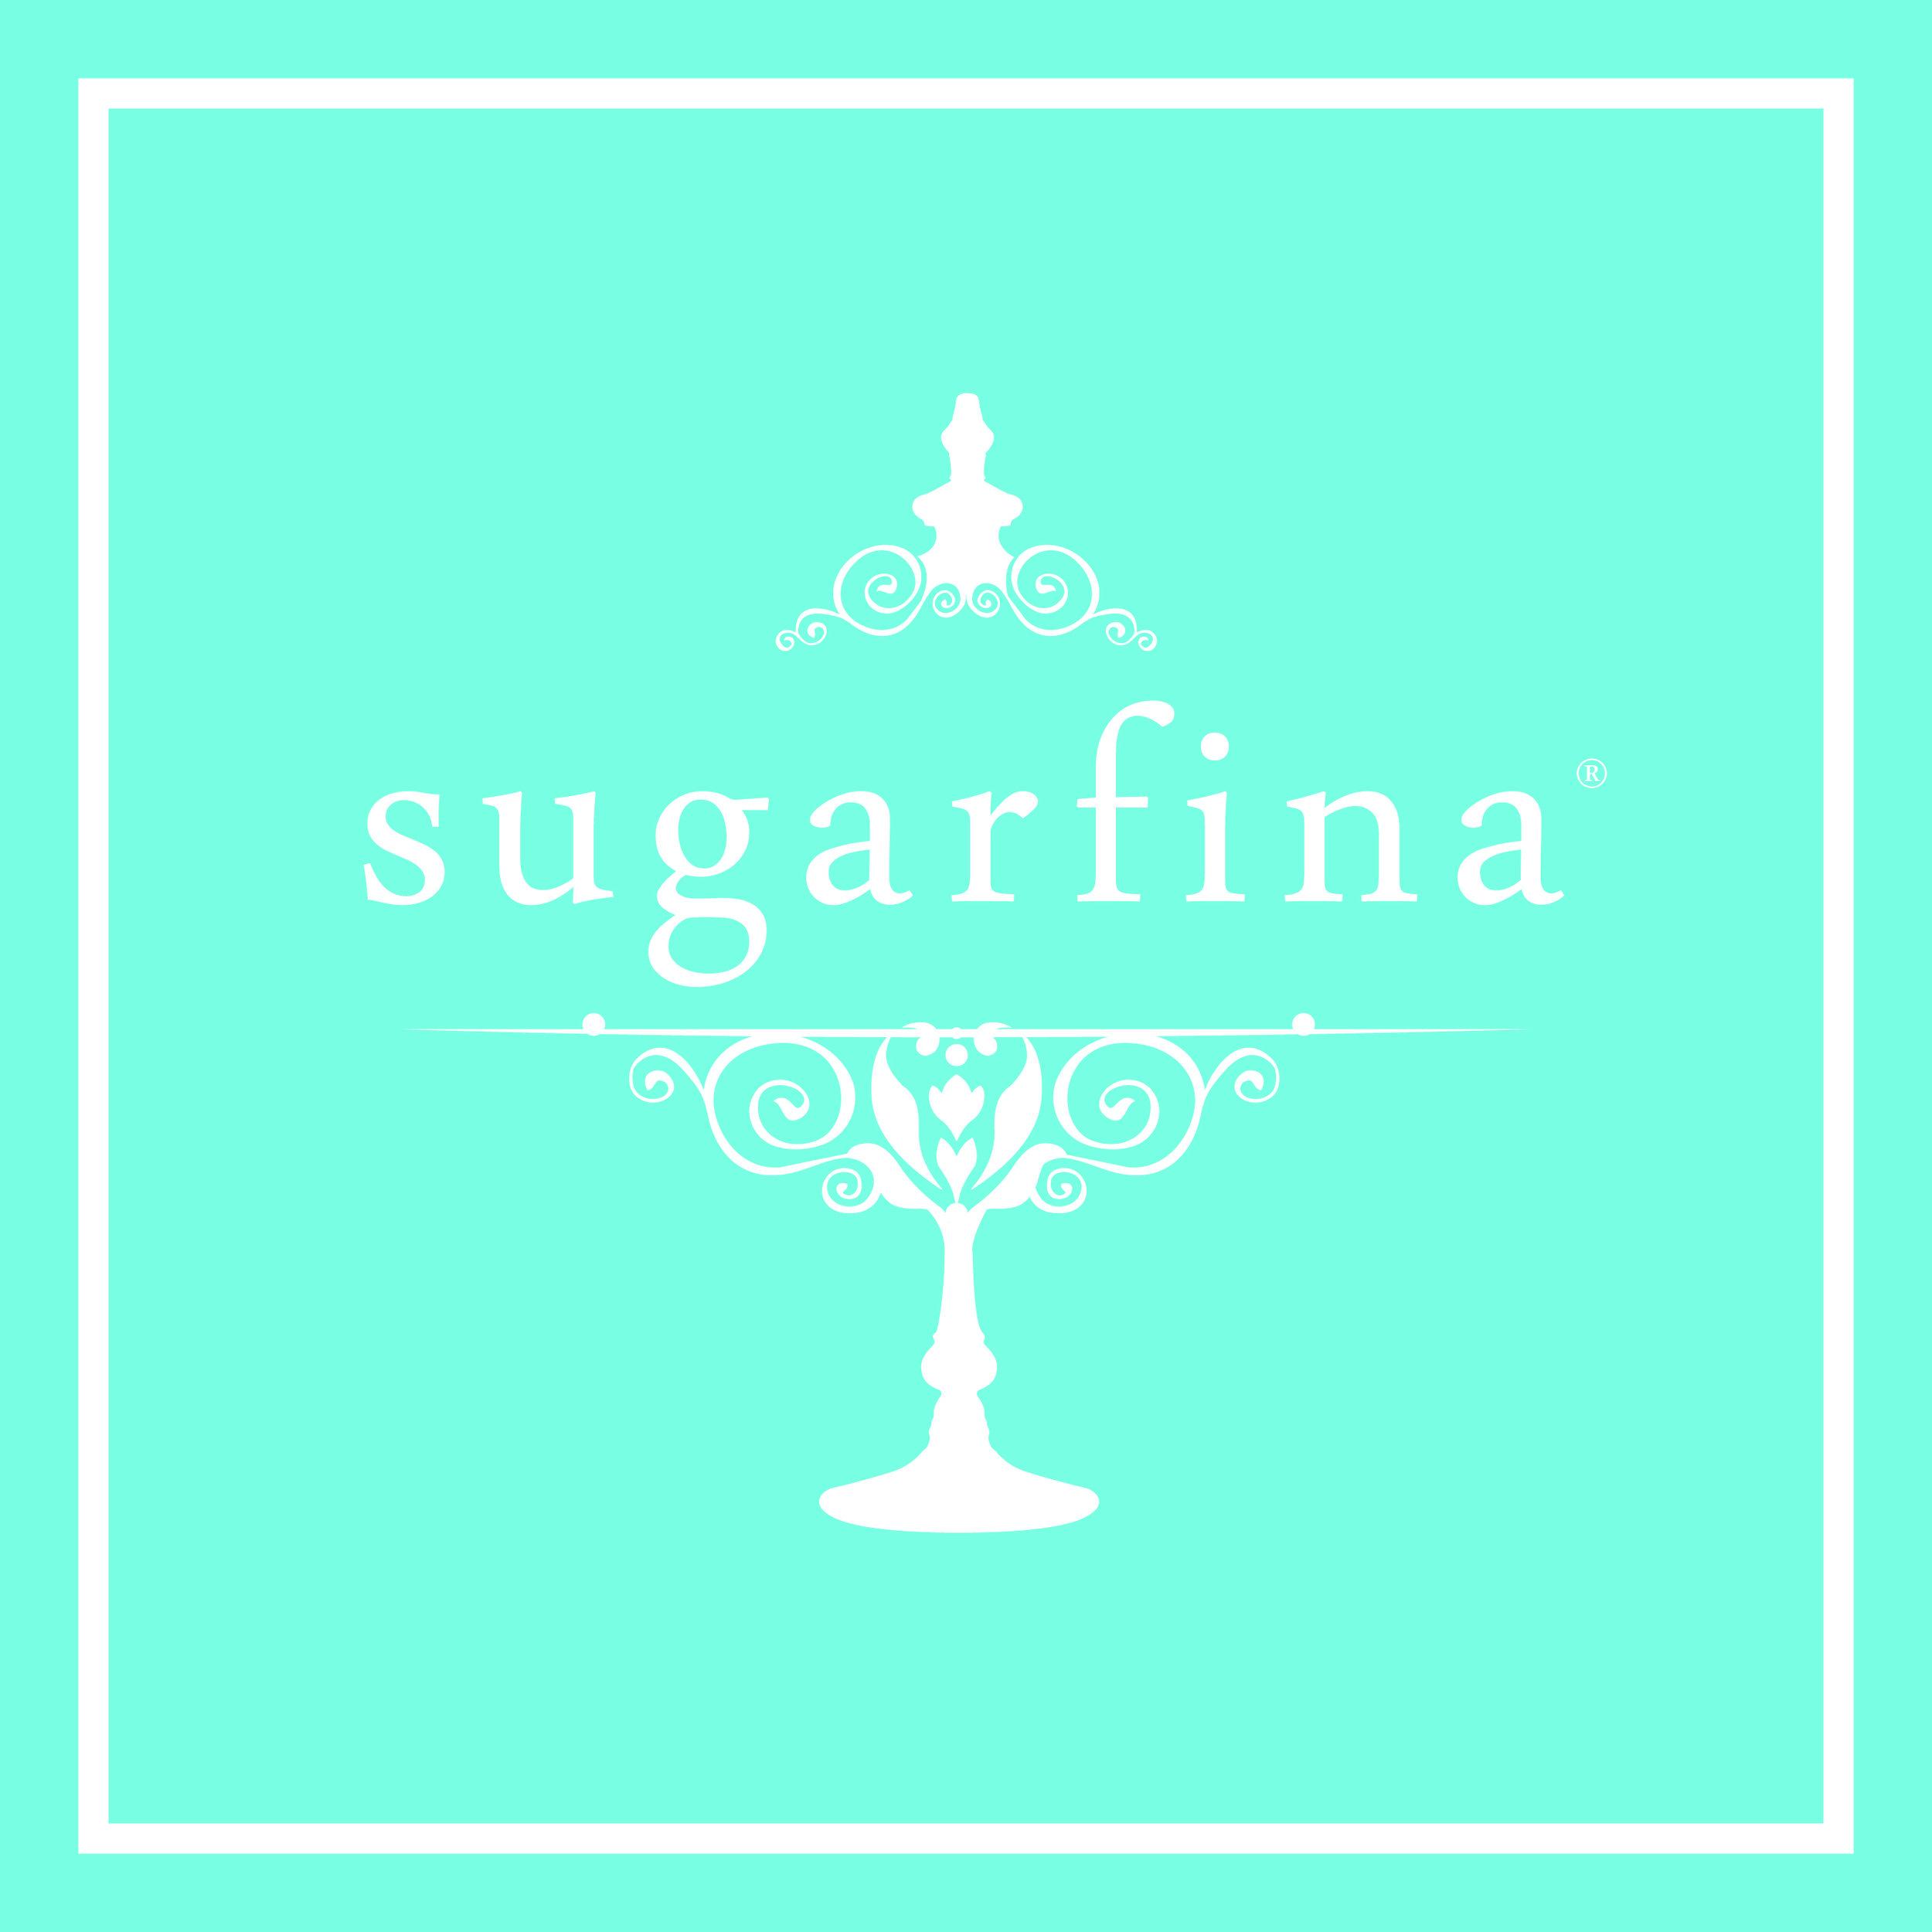 Sugarfina_square logo.jpg